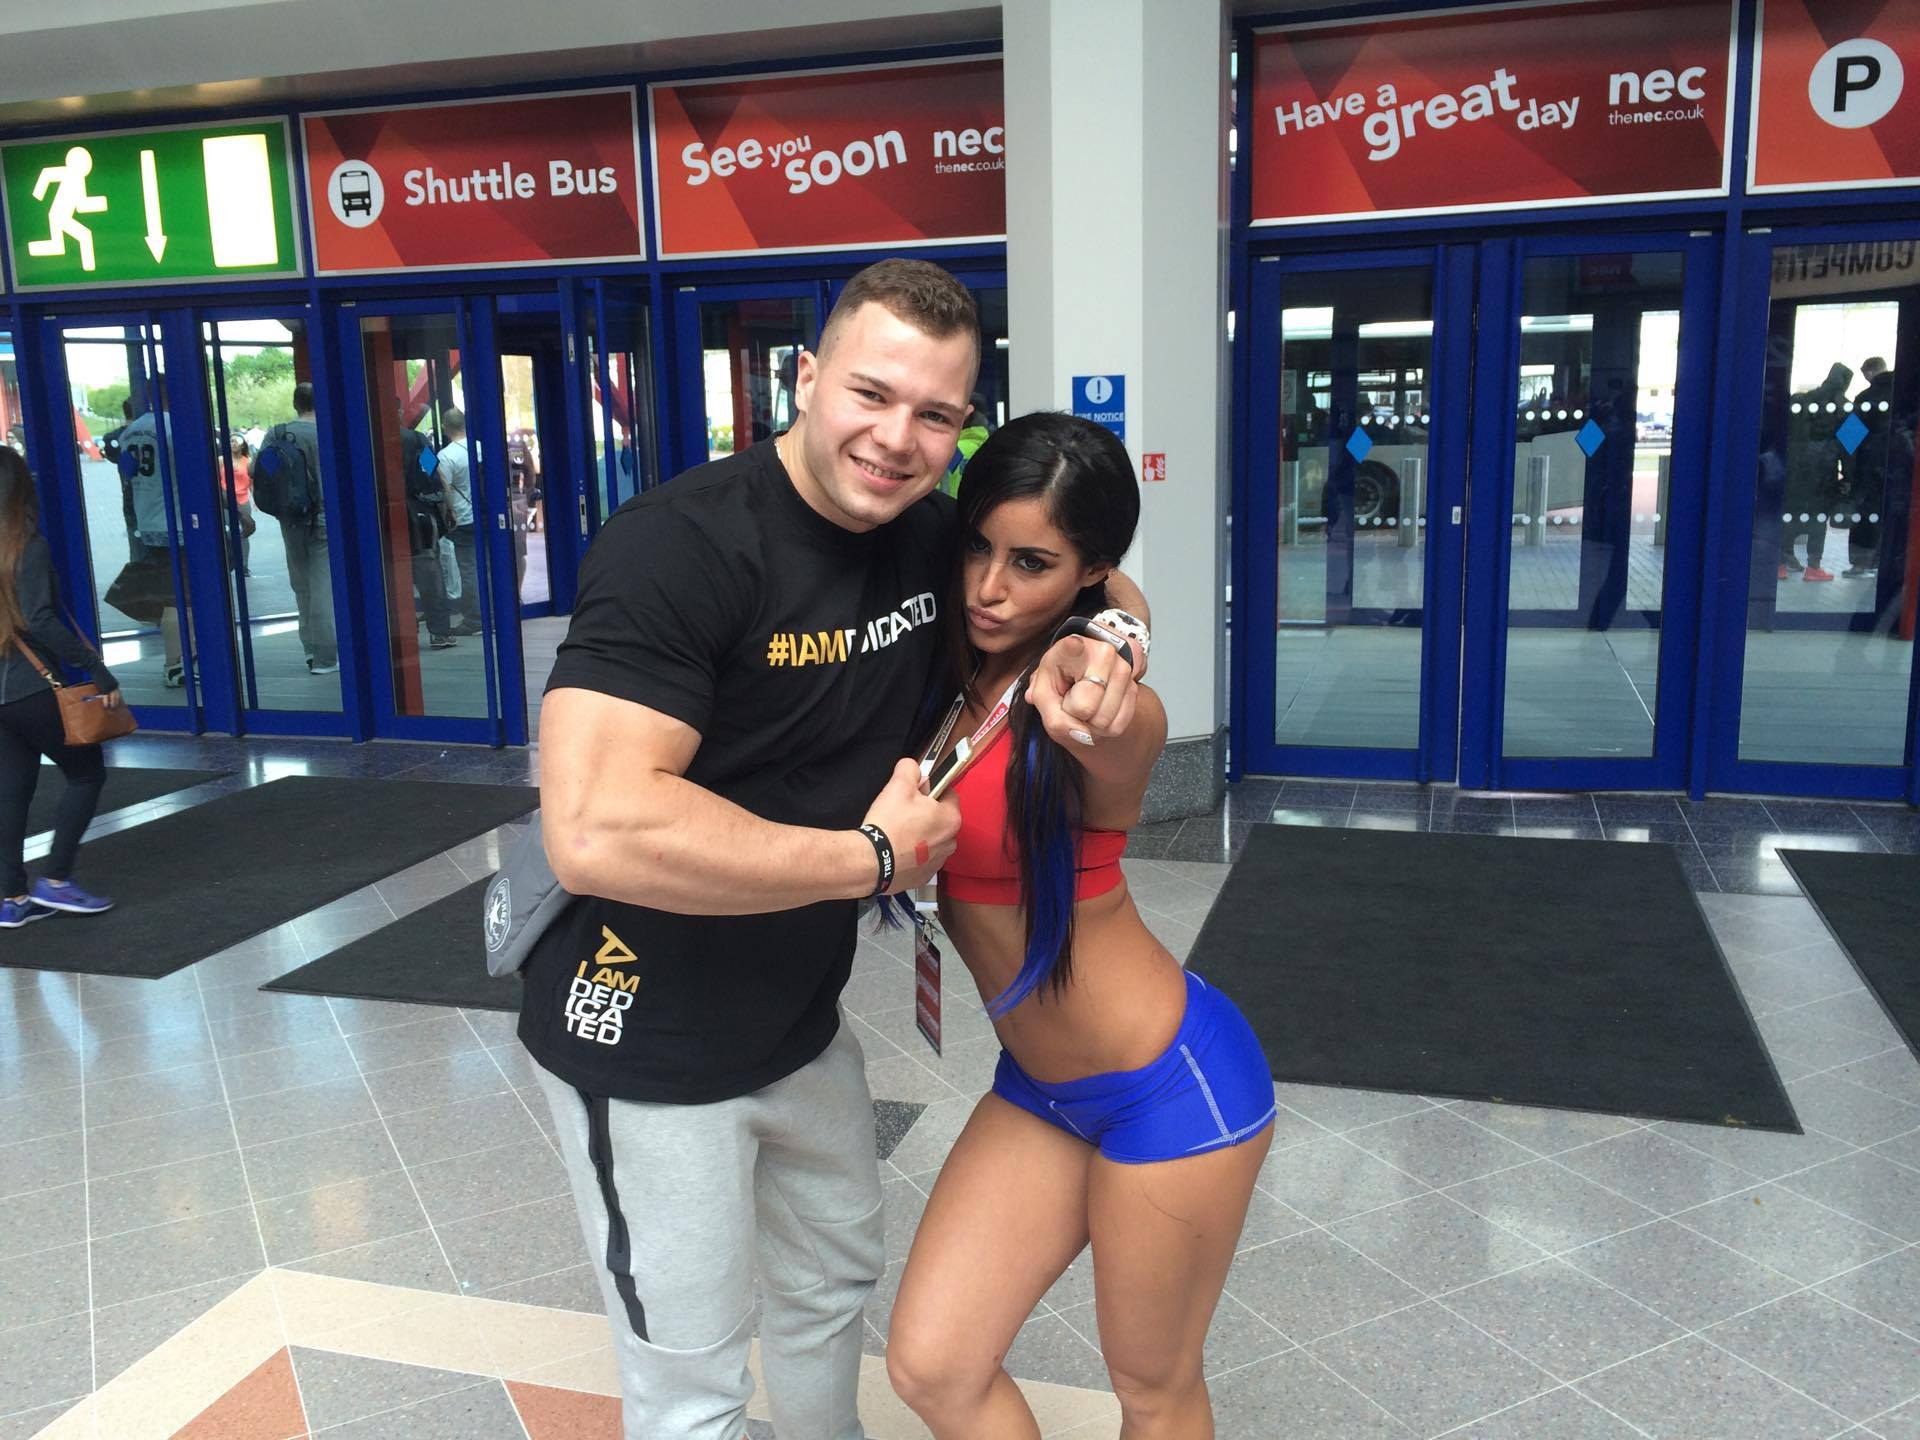 MMB Andrzej & Alysia Magen